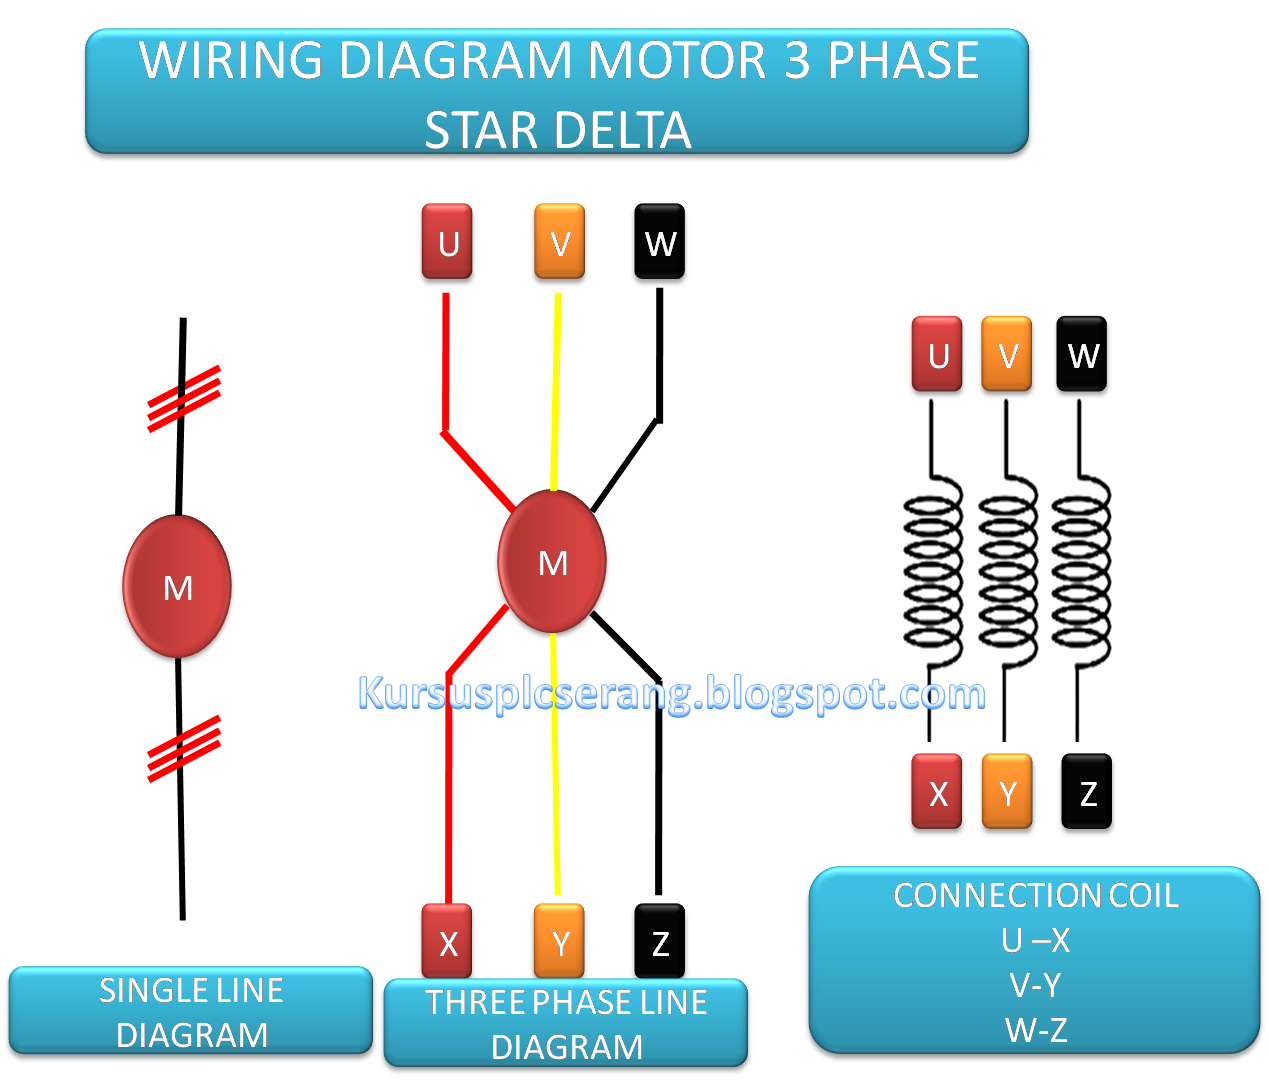 3 phase motor wiring diagram star delta 2000 jetta vr6 rangkaian privat plc belajar